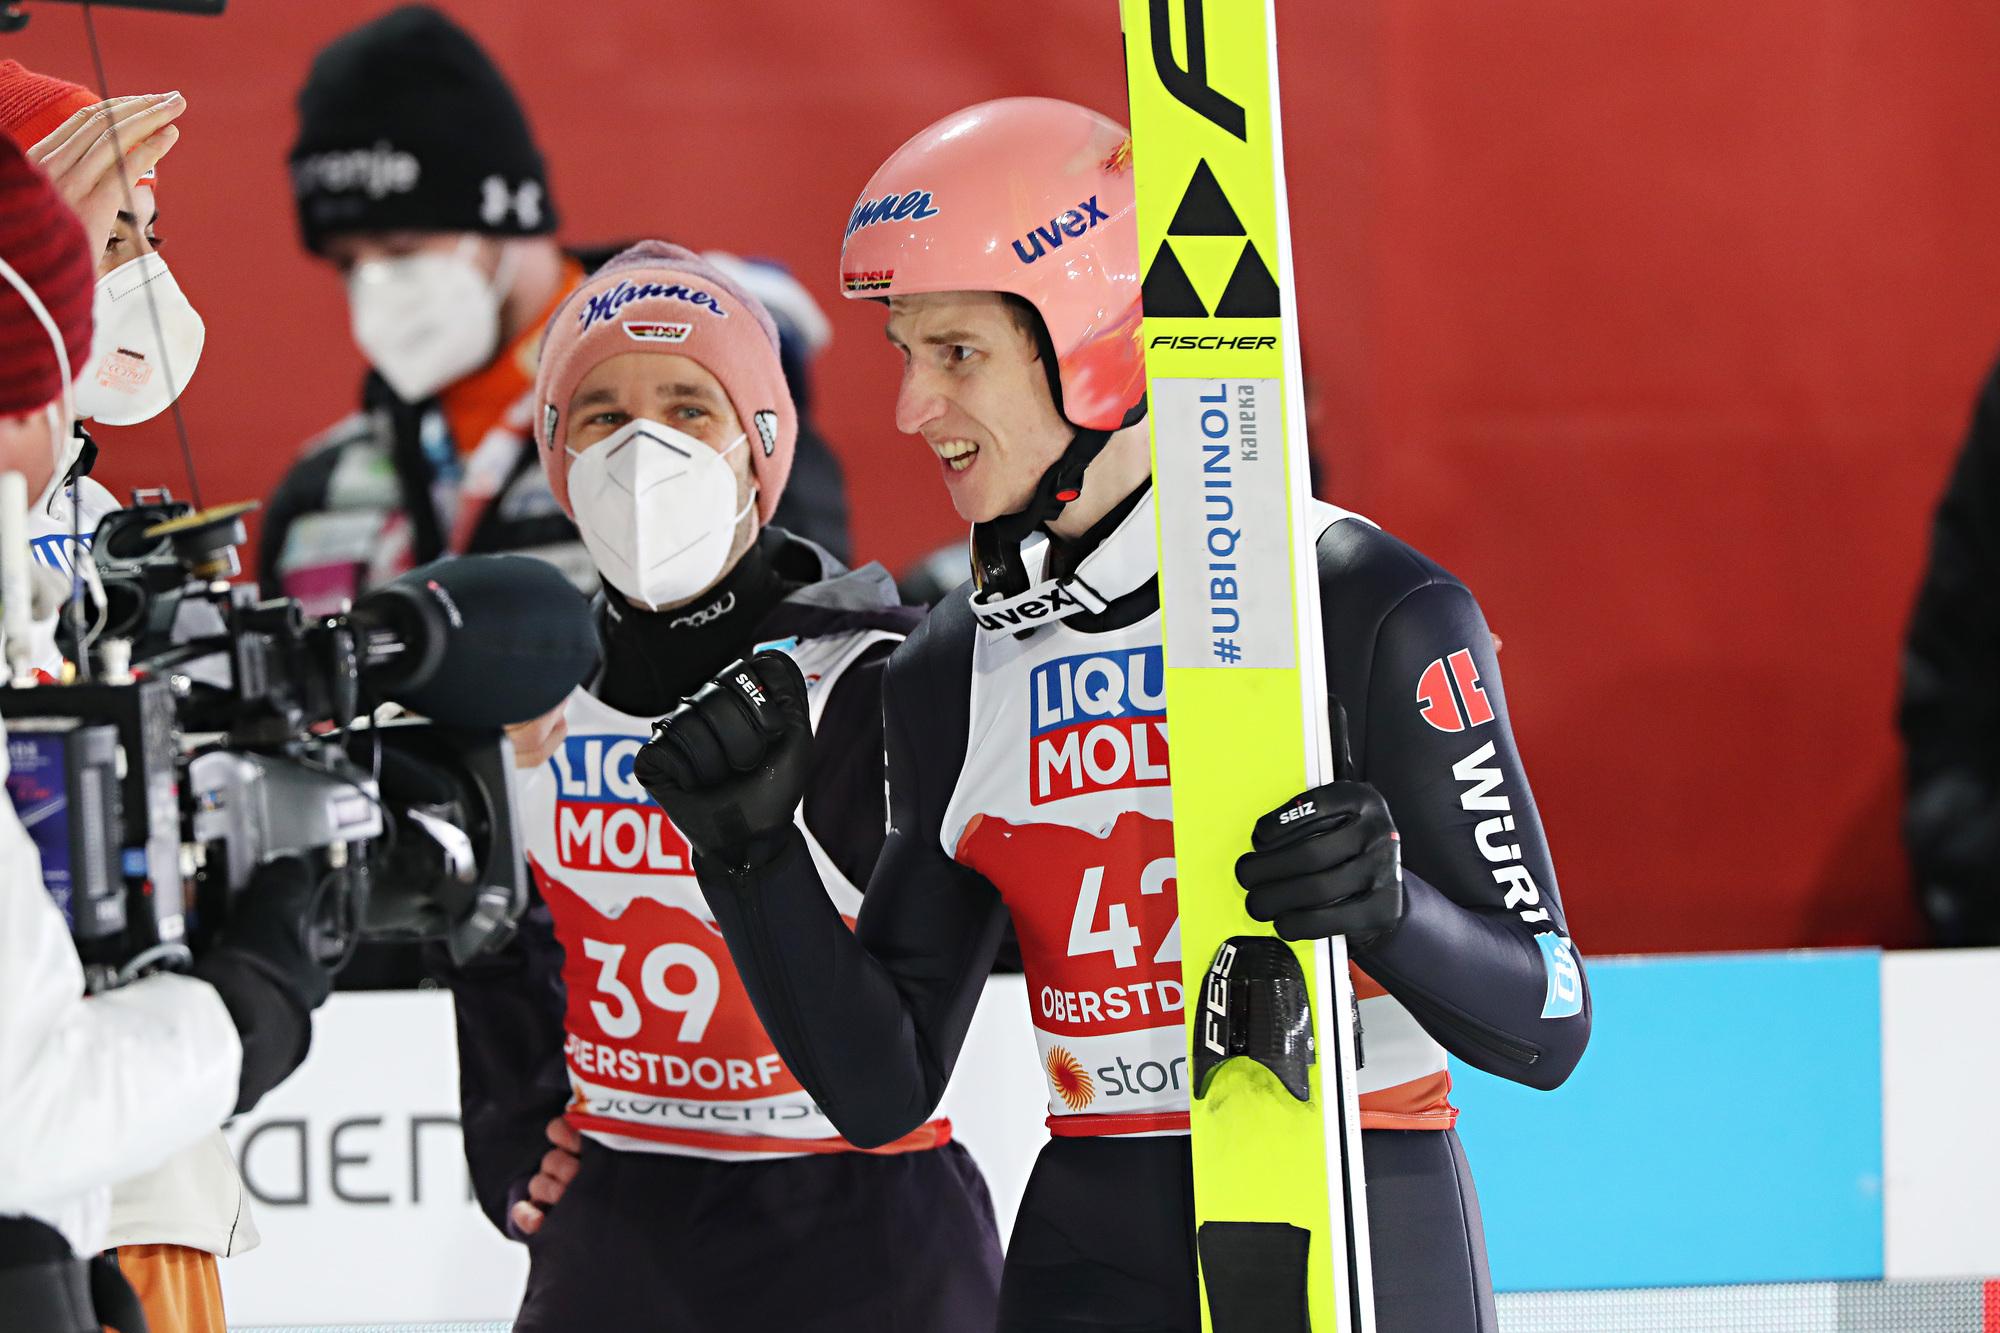 Olympische Winterspiele 2021 Skispringen